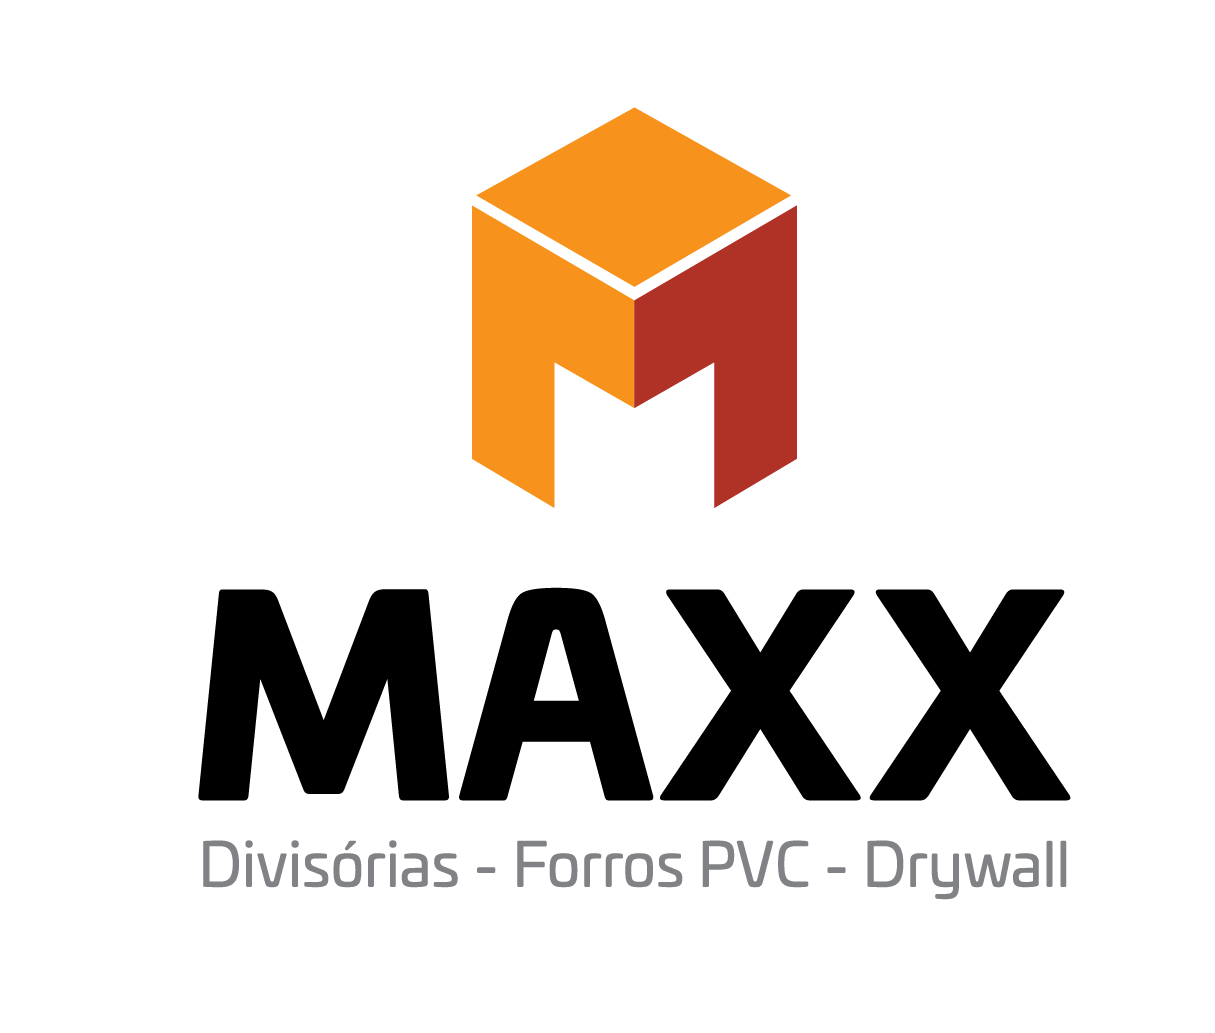 Drywall para Ambiente Externo Preço Tatuapé - Drywall para Teto - Maxx Forro